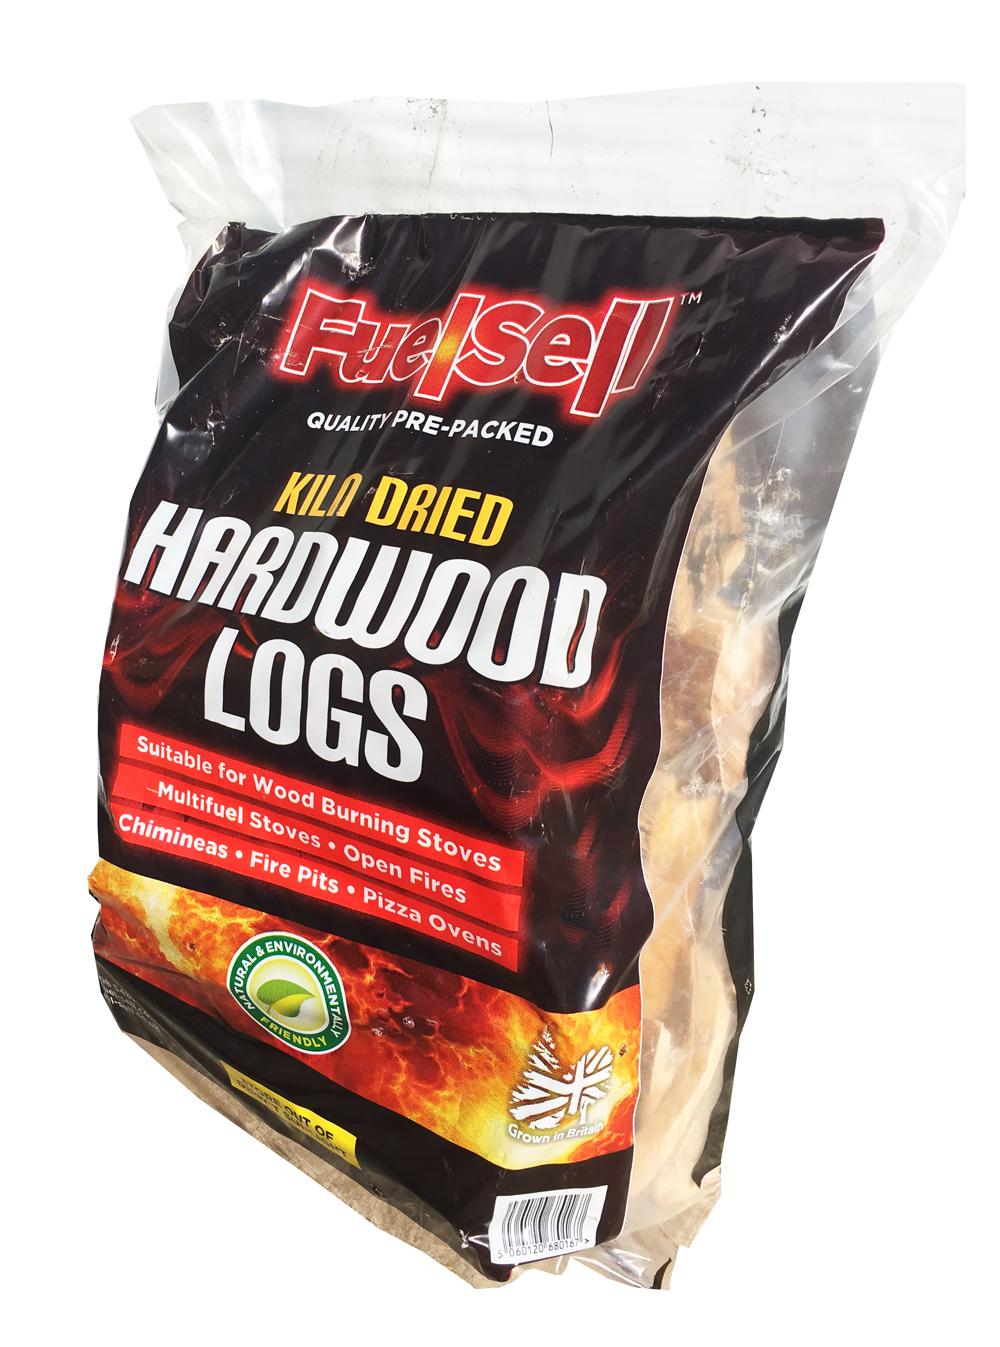 FuelSell Bag of Kiln Dried Hardwood Logs